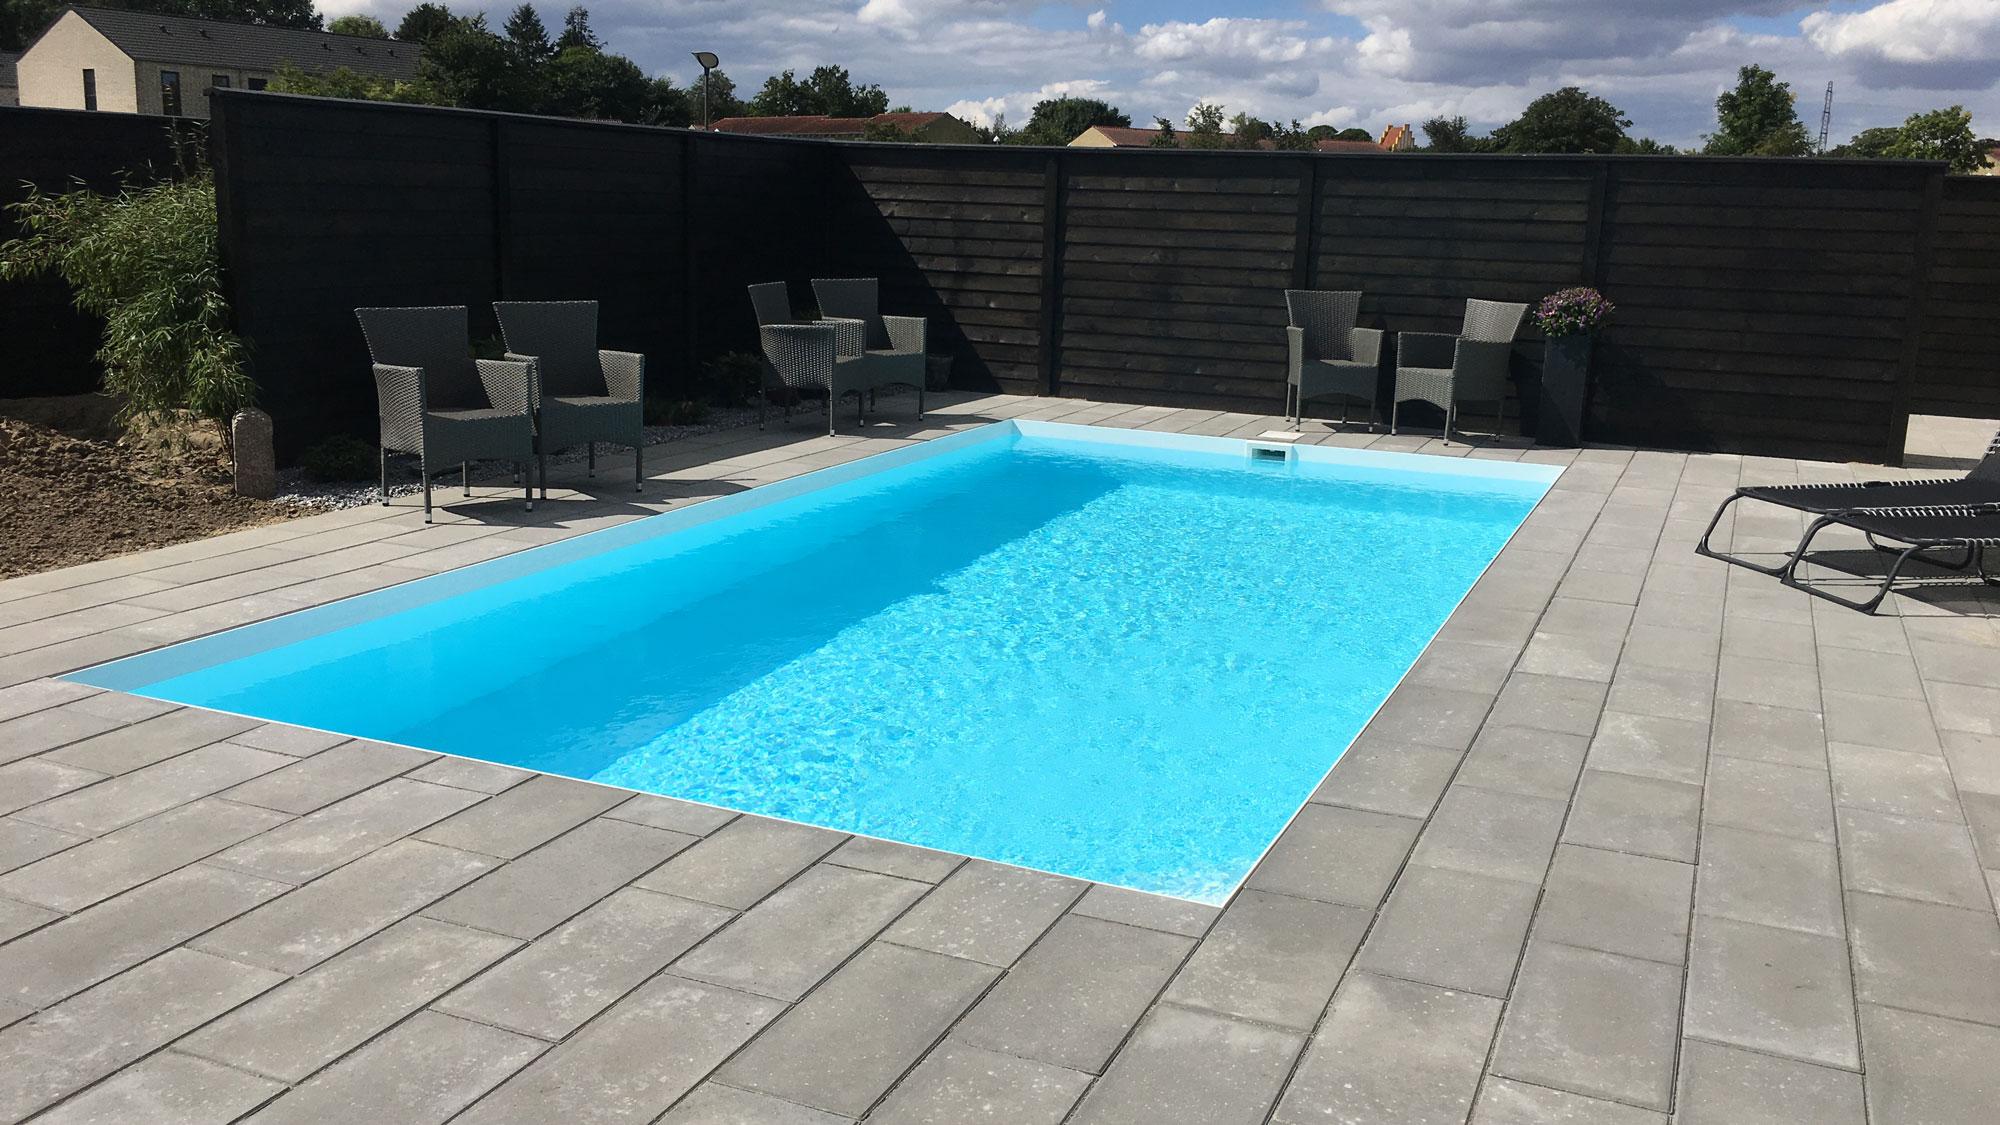 Pool standard